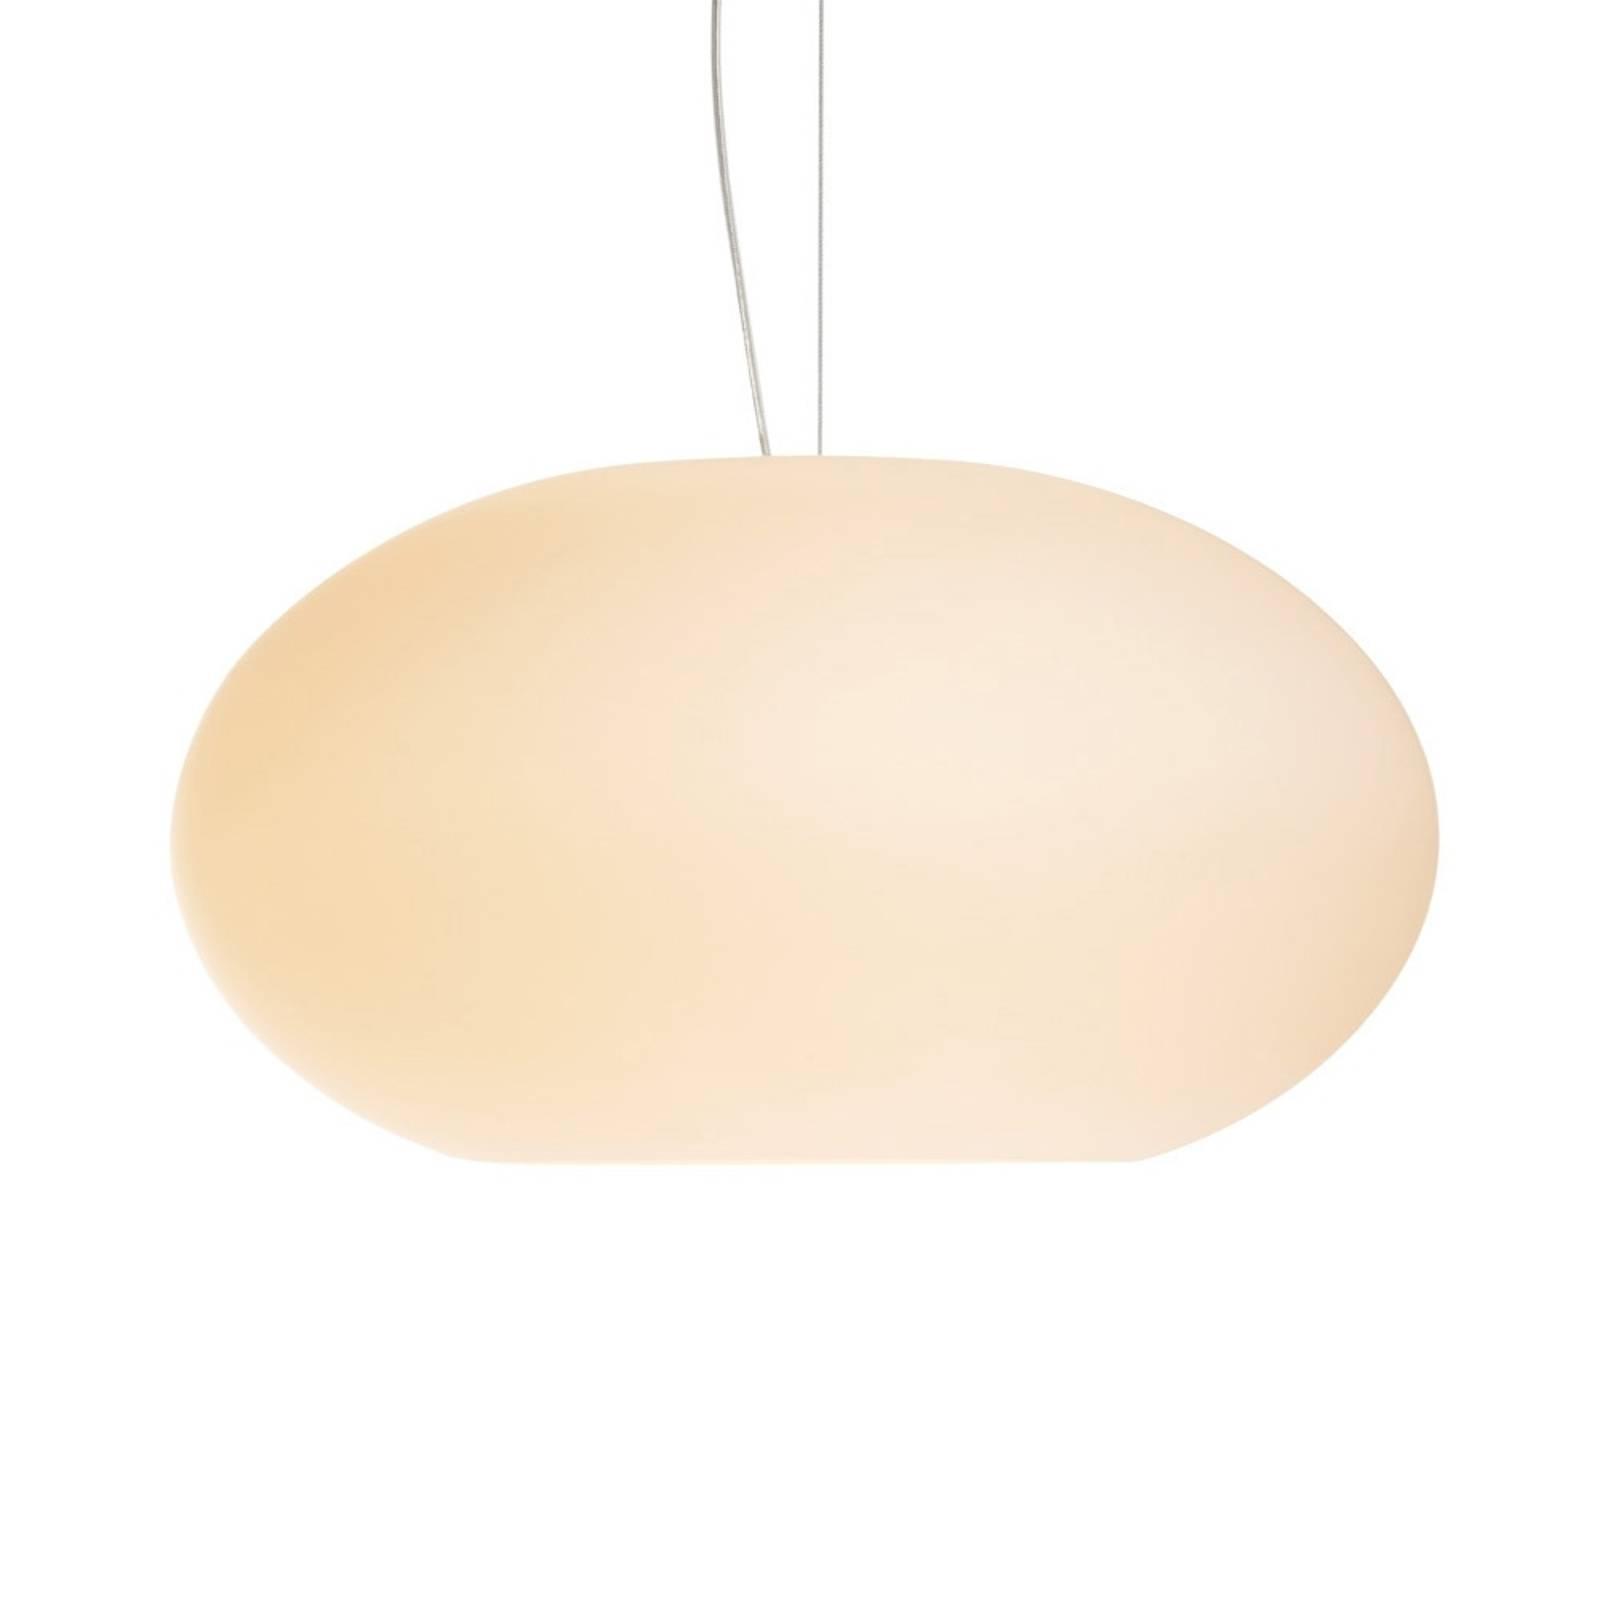 AIH, strakke hanglamp, 28 cm, crème mat